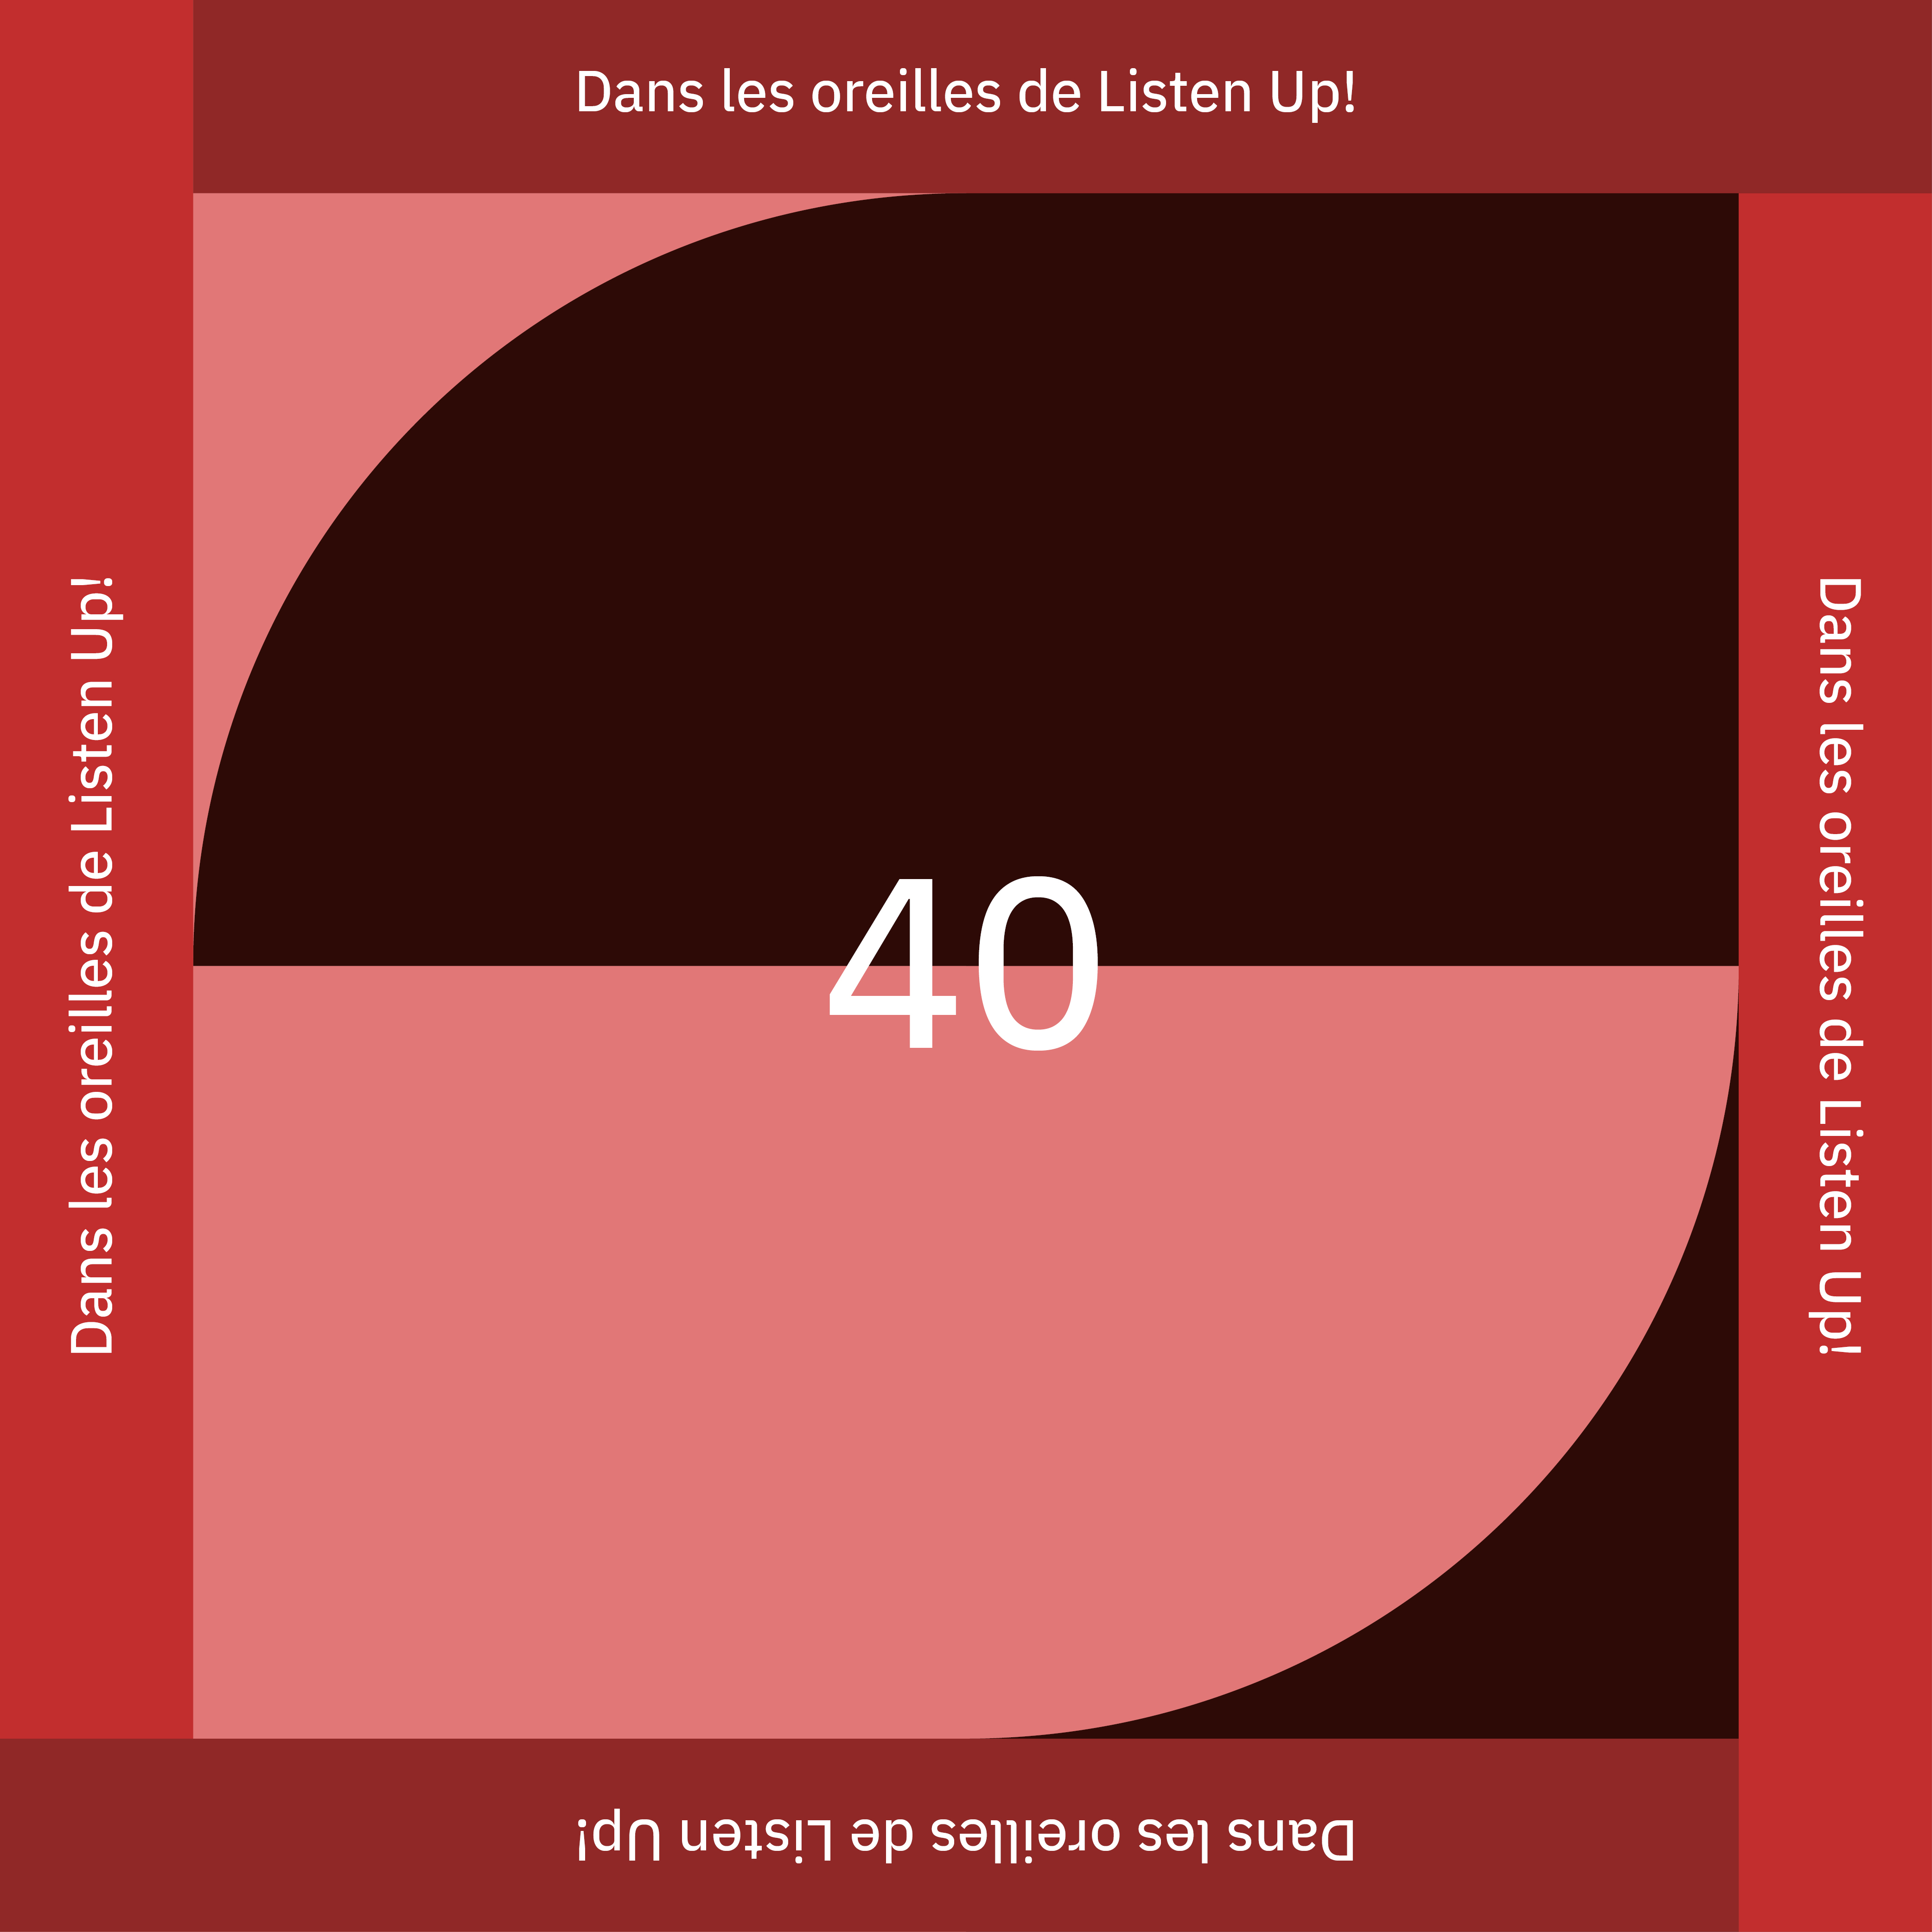 DLO_LISTENUP #40